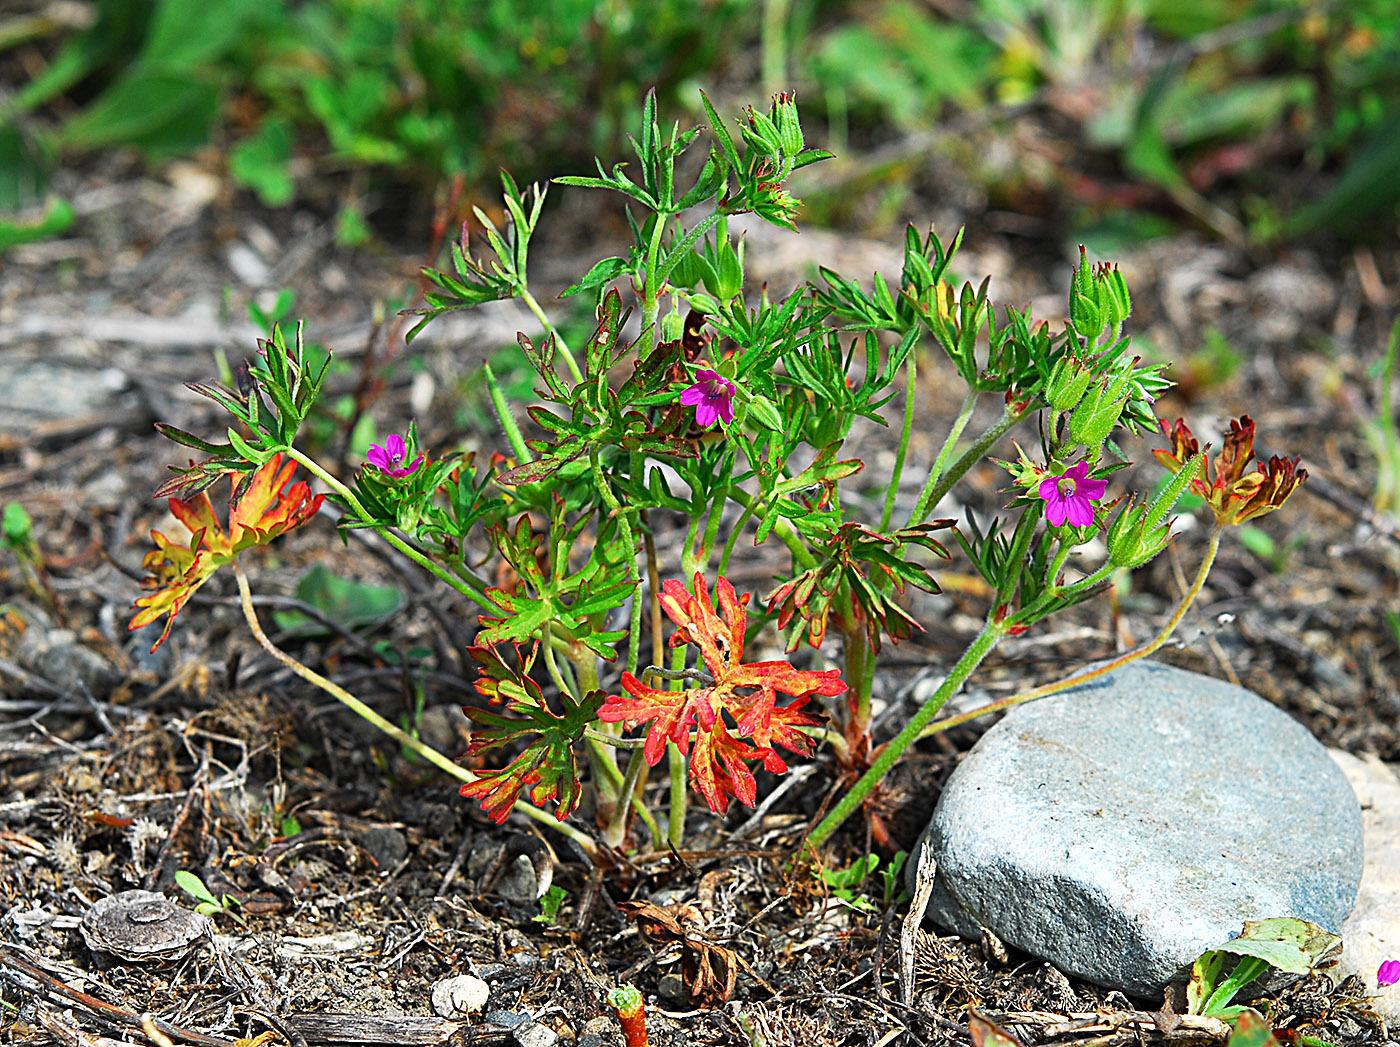 https://pictures.bgbm.org/digilib/Scaler?fn=Cyprus/Geranium_dissectum_A1.jpg&mo=file